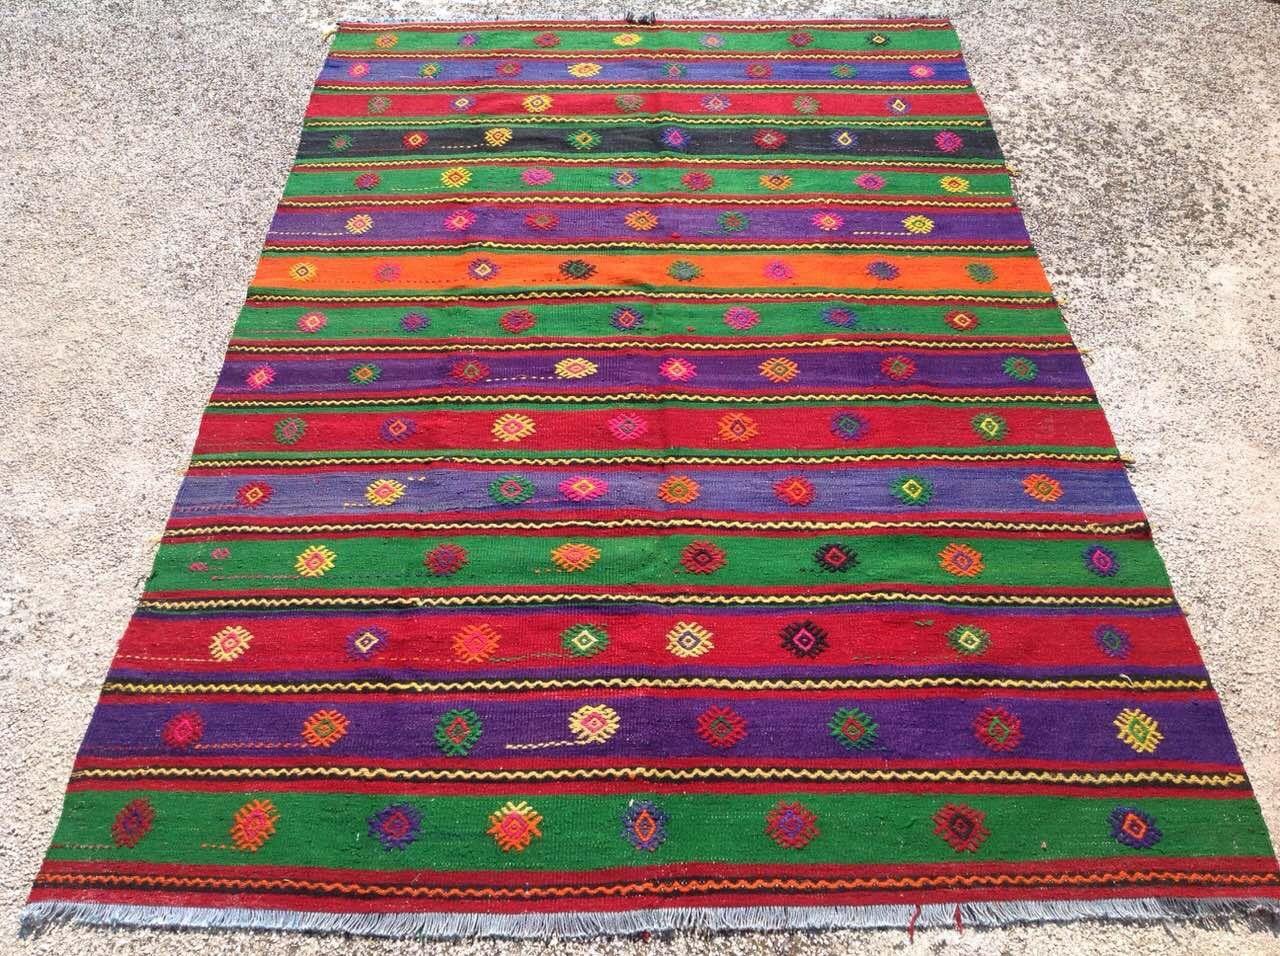 colorful striped area rug 111 5 x 73 purple green